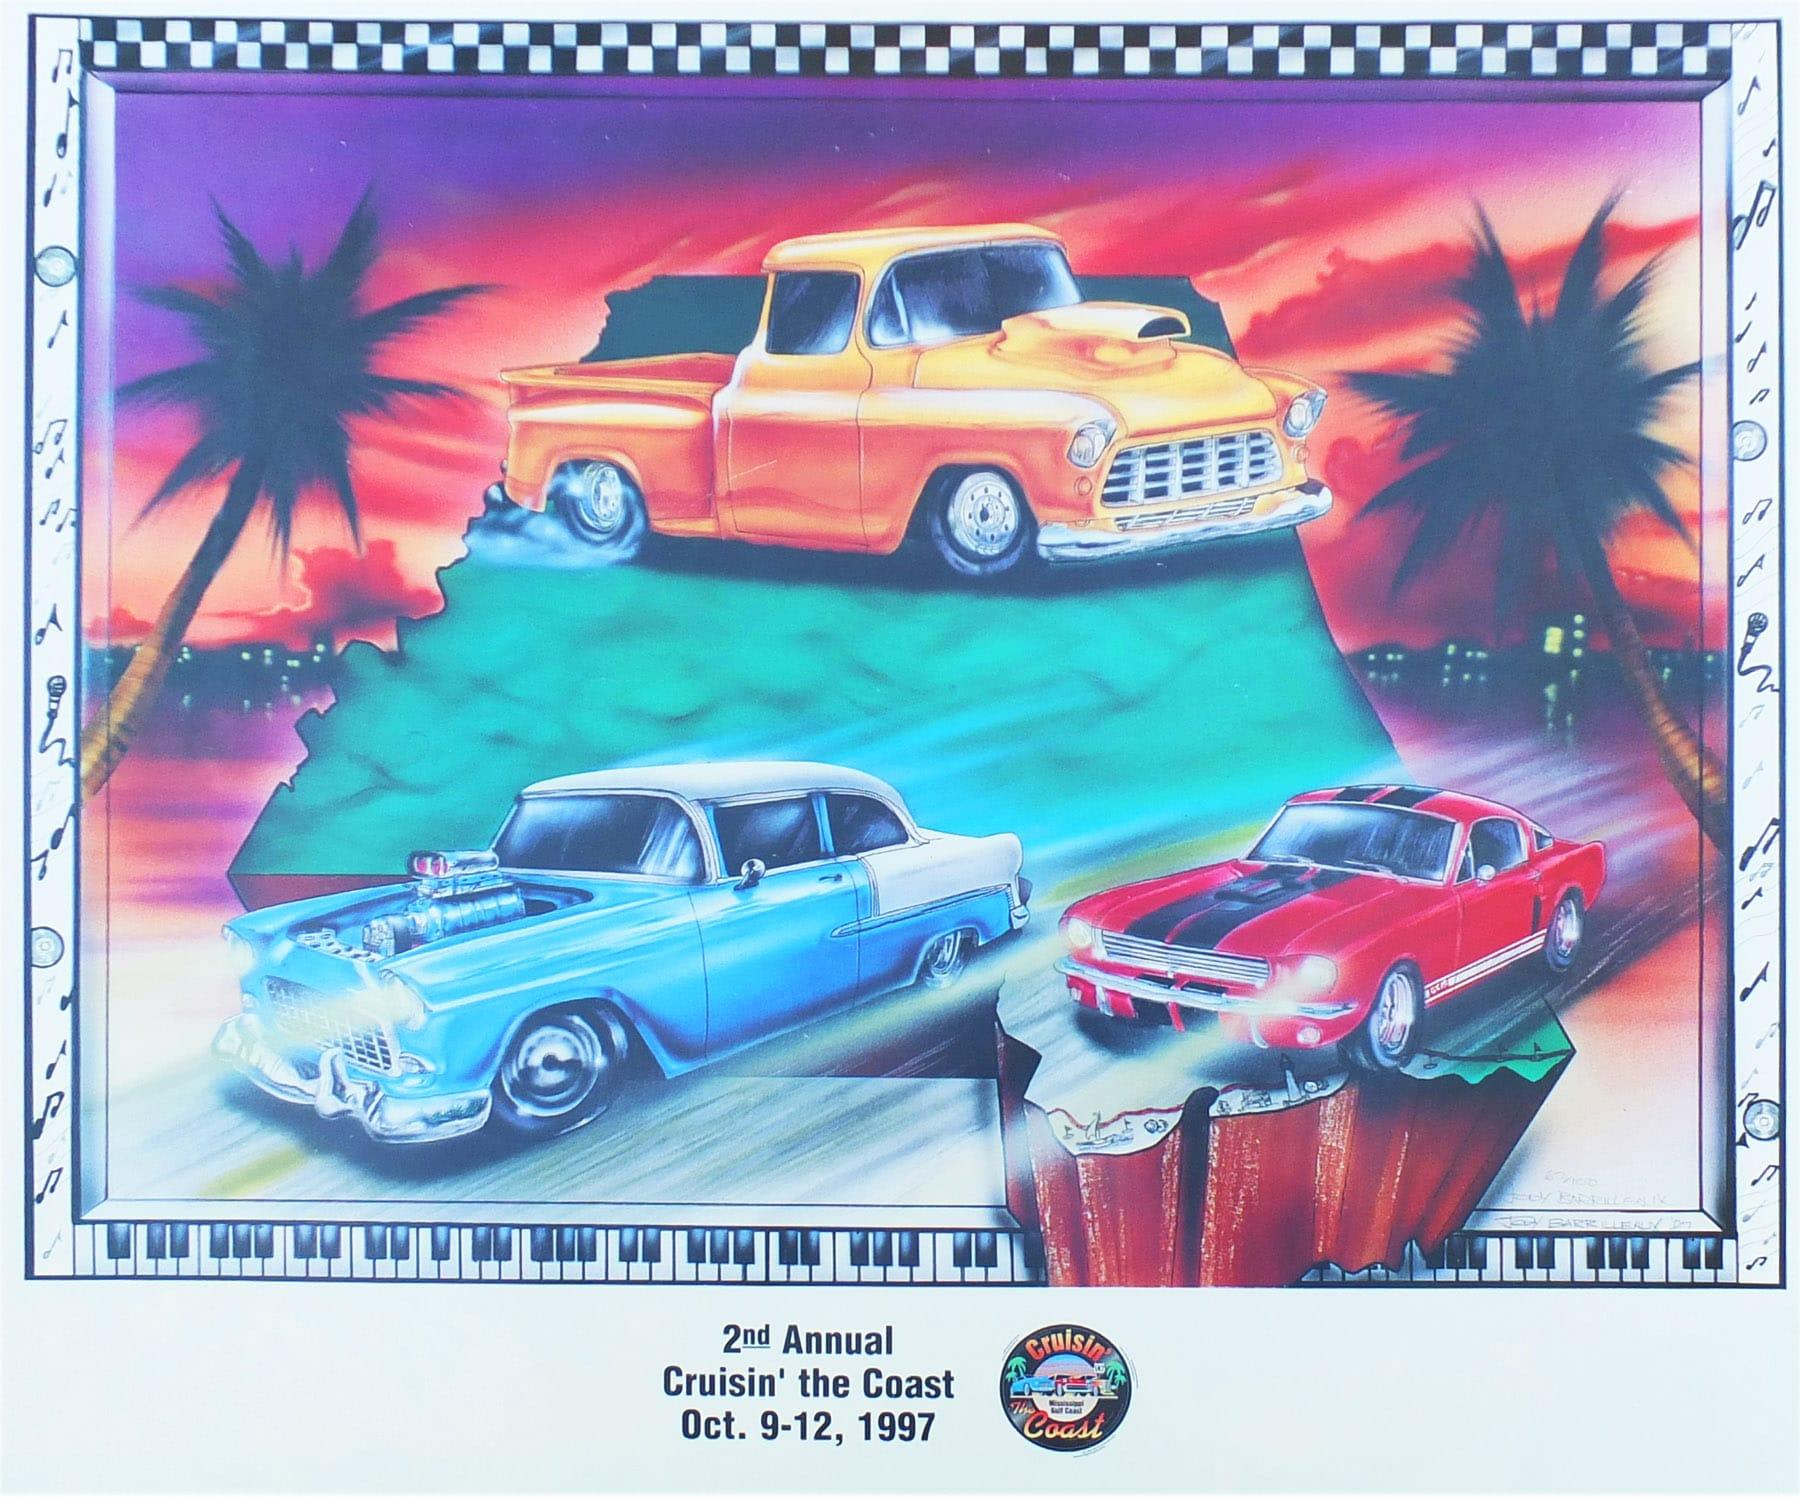 Cruisin' the Coast poster 1997